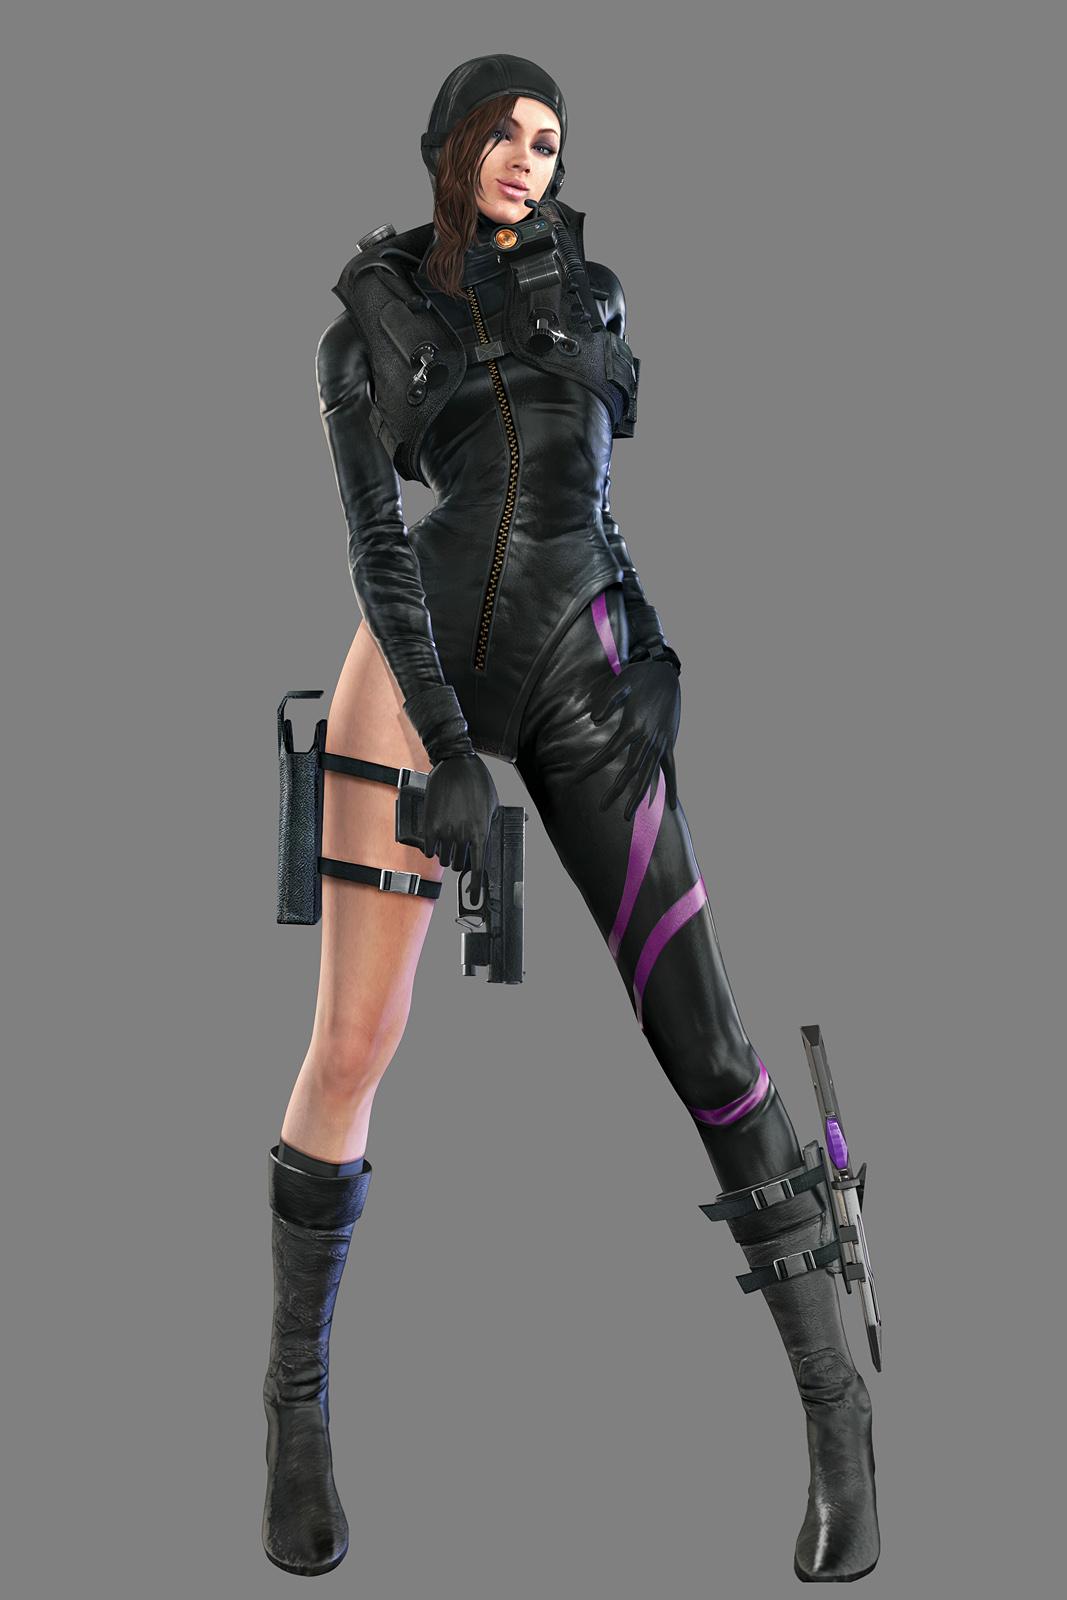 Resident evil 4 pono nsfw stripper